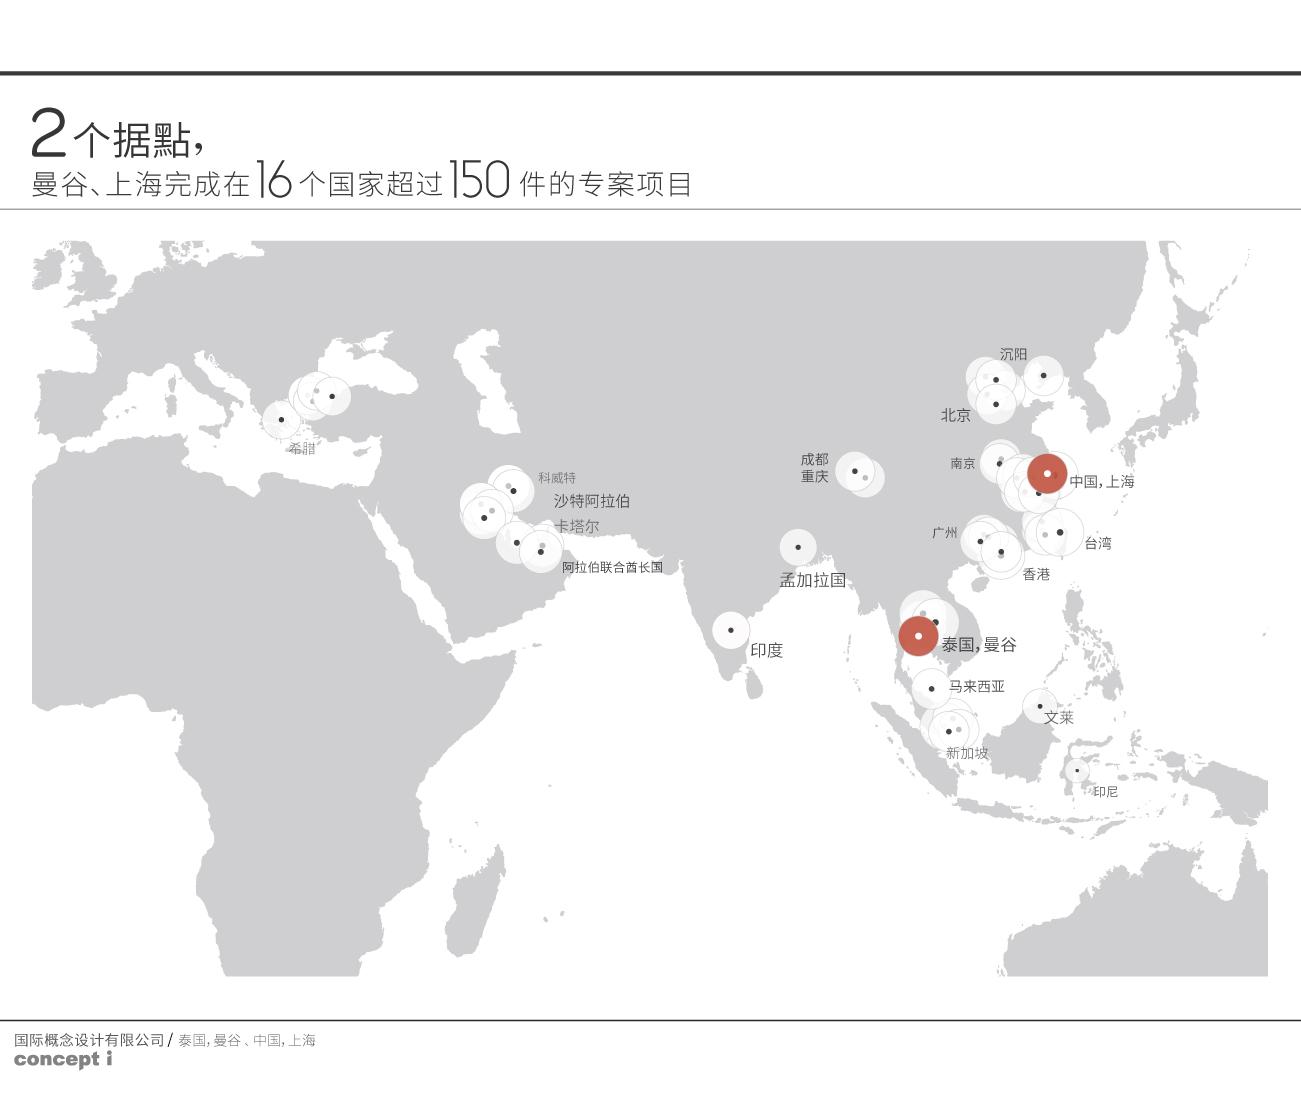 concept-i-world-map-WEB-CN